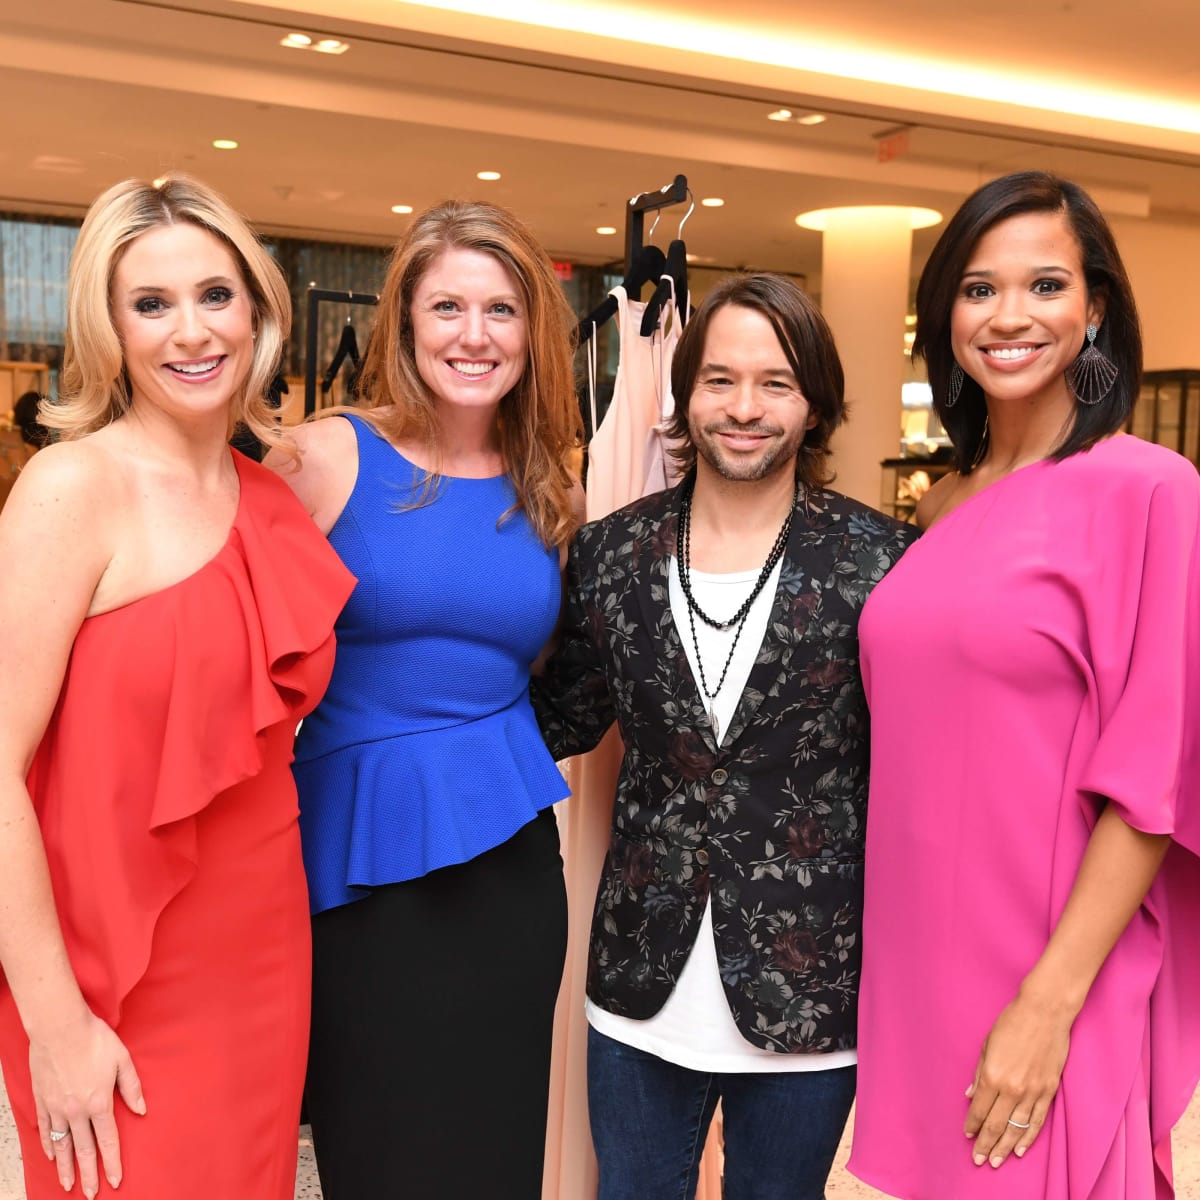 Women of Wardrobe, Aug. 2016, Chita Craft, Susan Oehl, Jay Godfrey, Mia Gradney